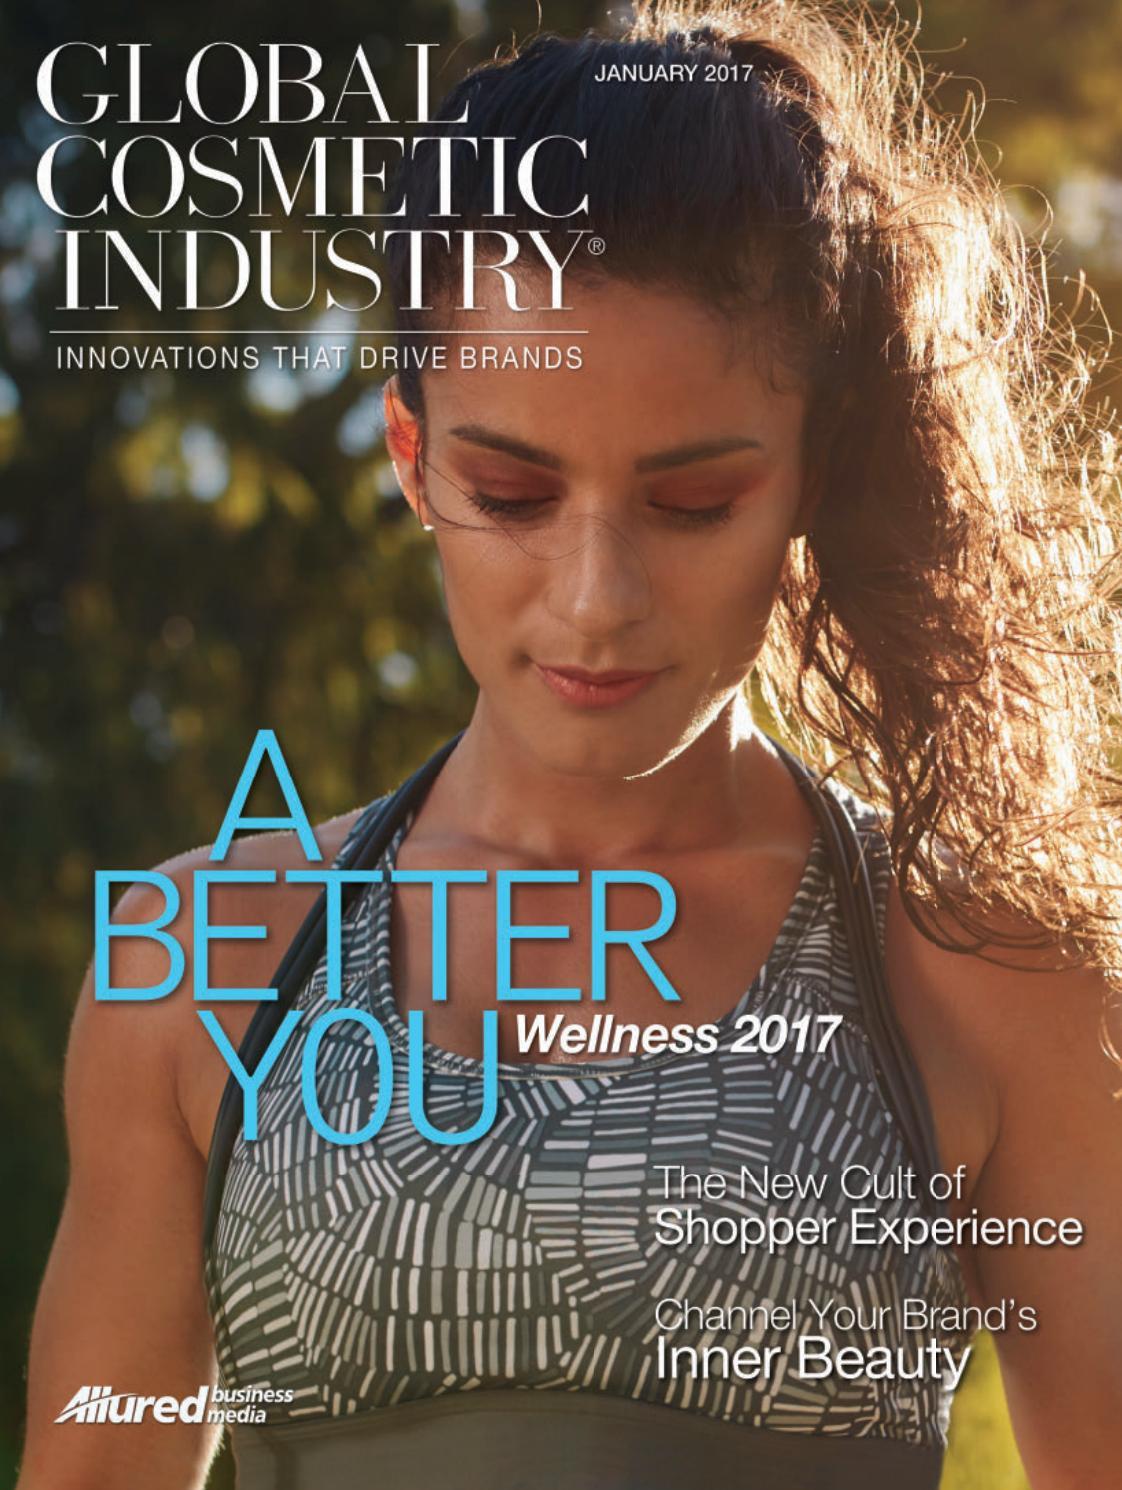 Gci Magazine 01 January 2017 By Bel Spa Issuu Axe Deodorant Bodyspray Score 150 Ml Twin Pack